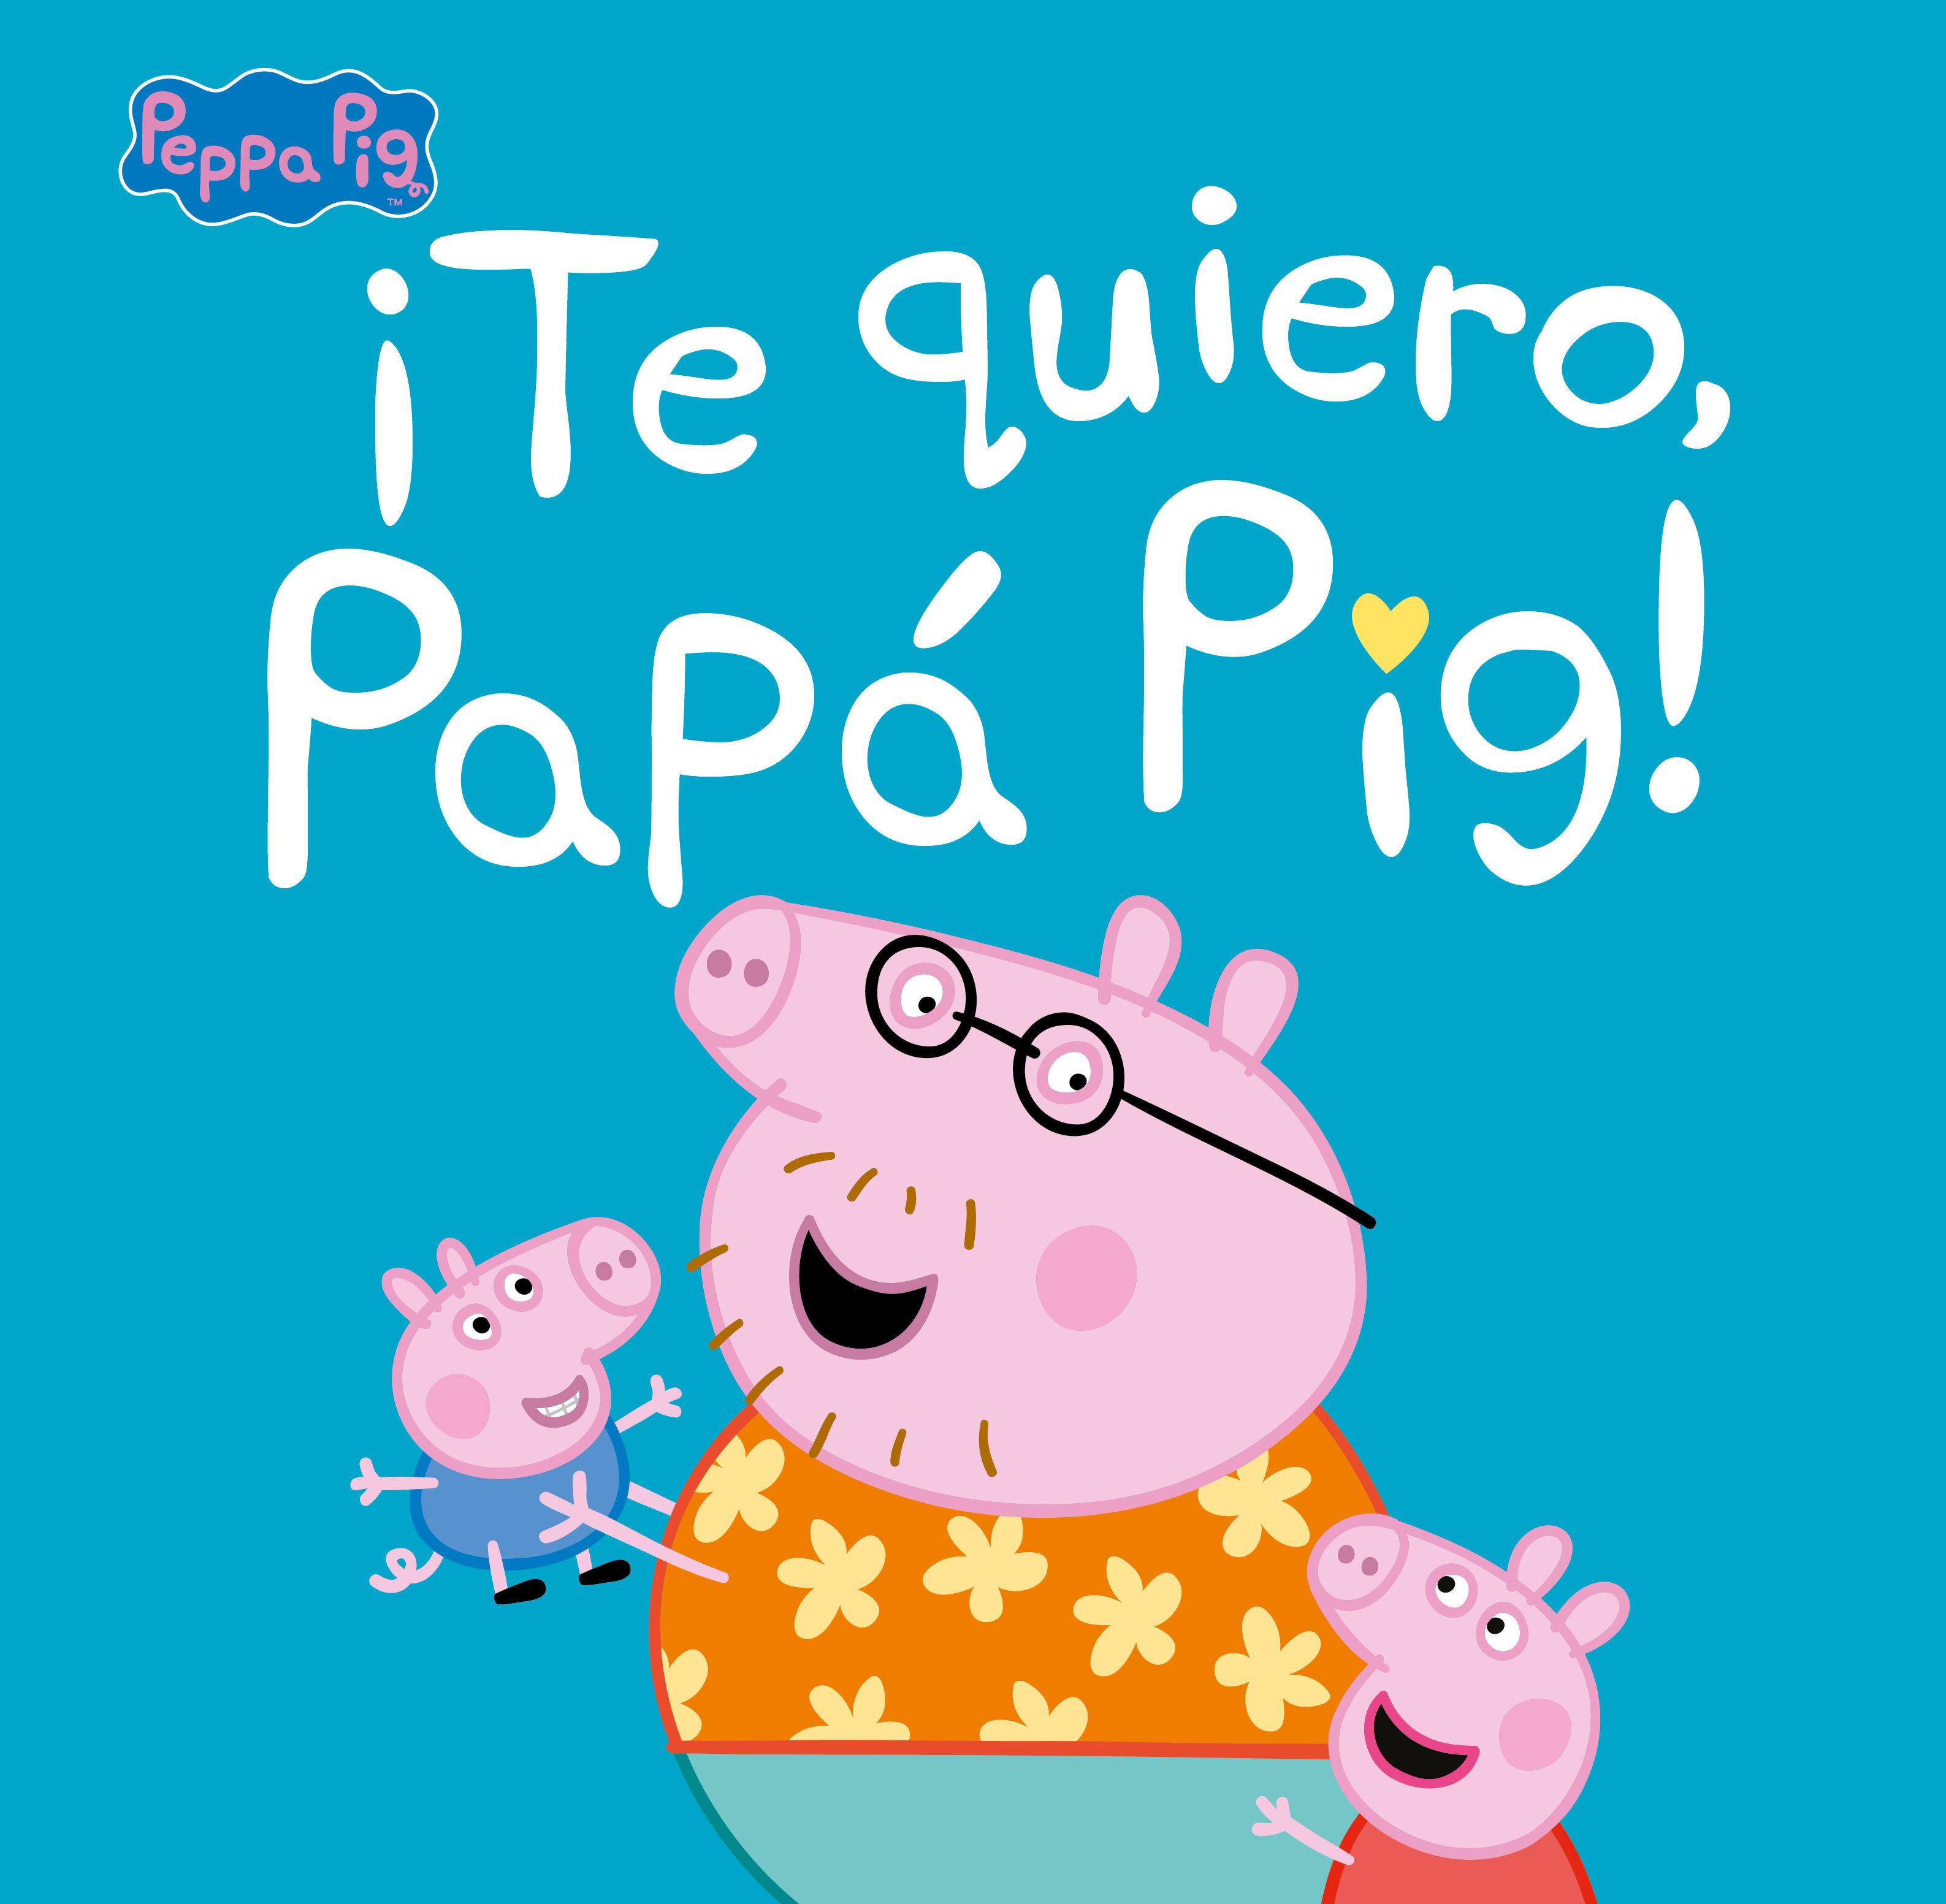 PEPPA PIG TE QUIERO PAPA PIG